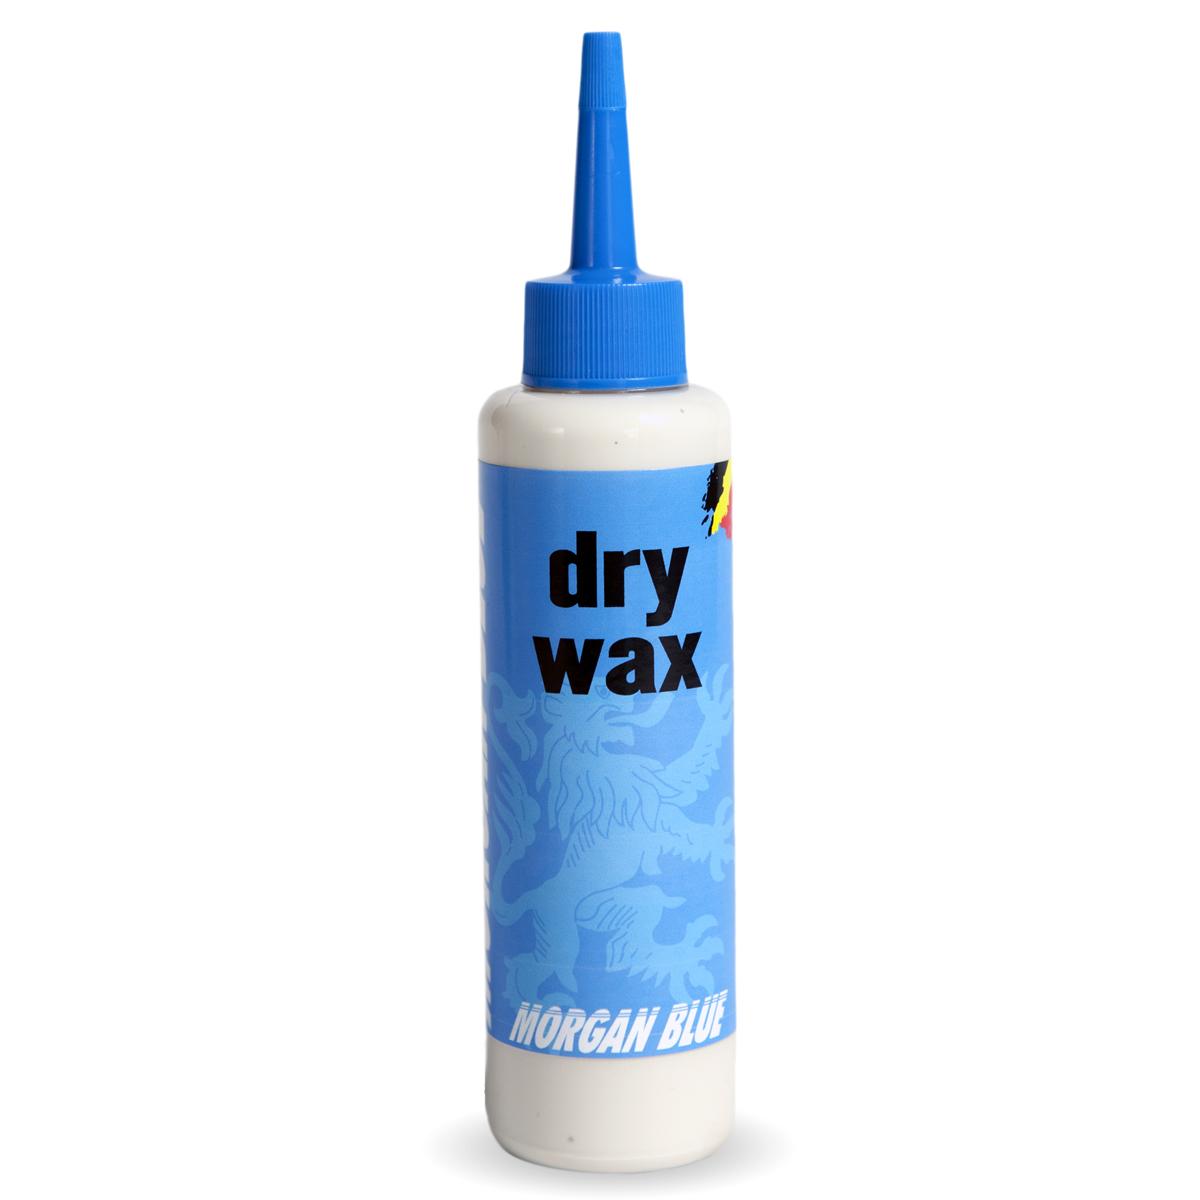 Morgan Blue Dry Wax Schmiermittel 125ml